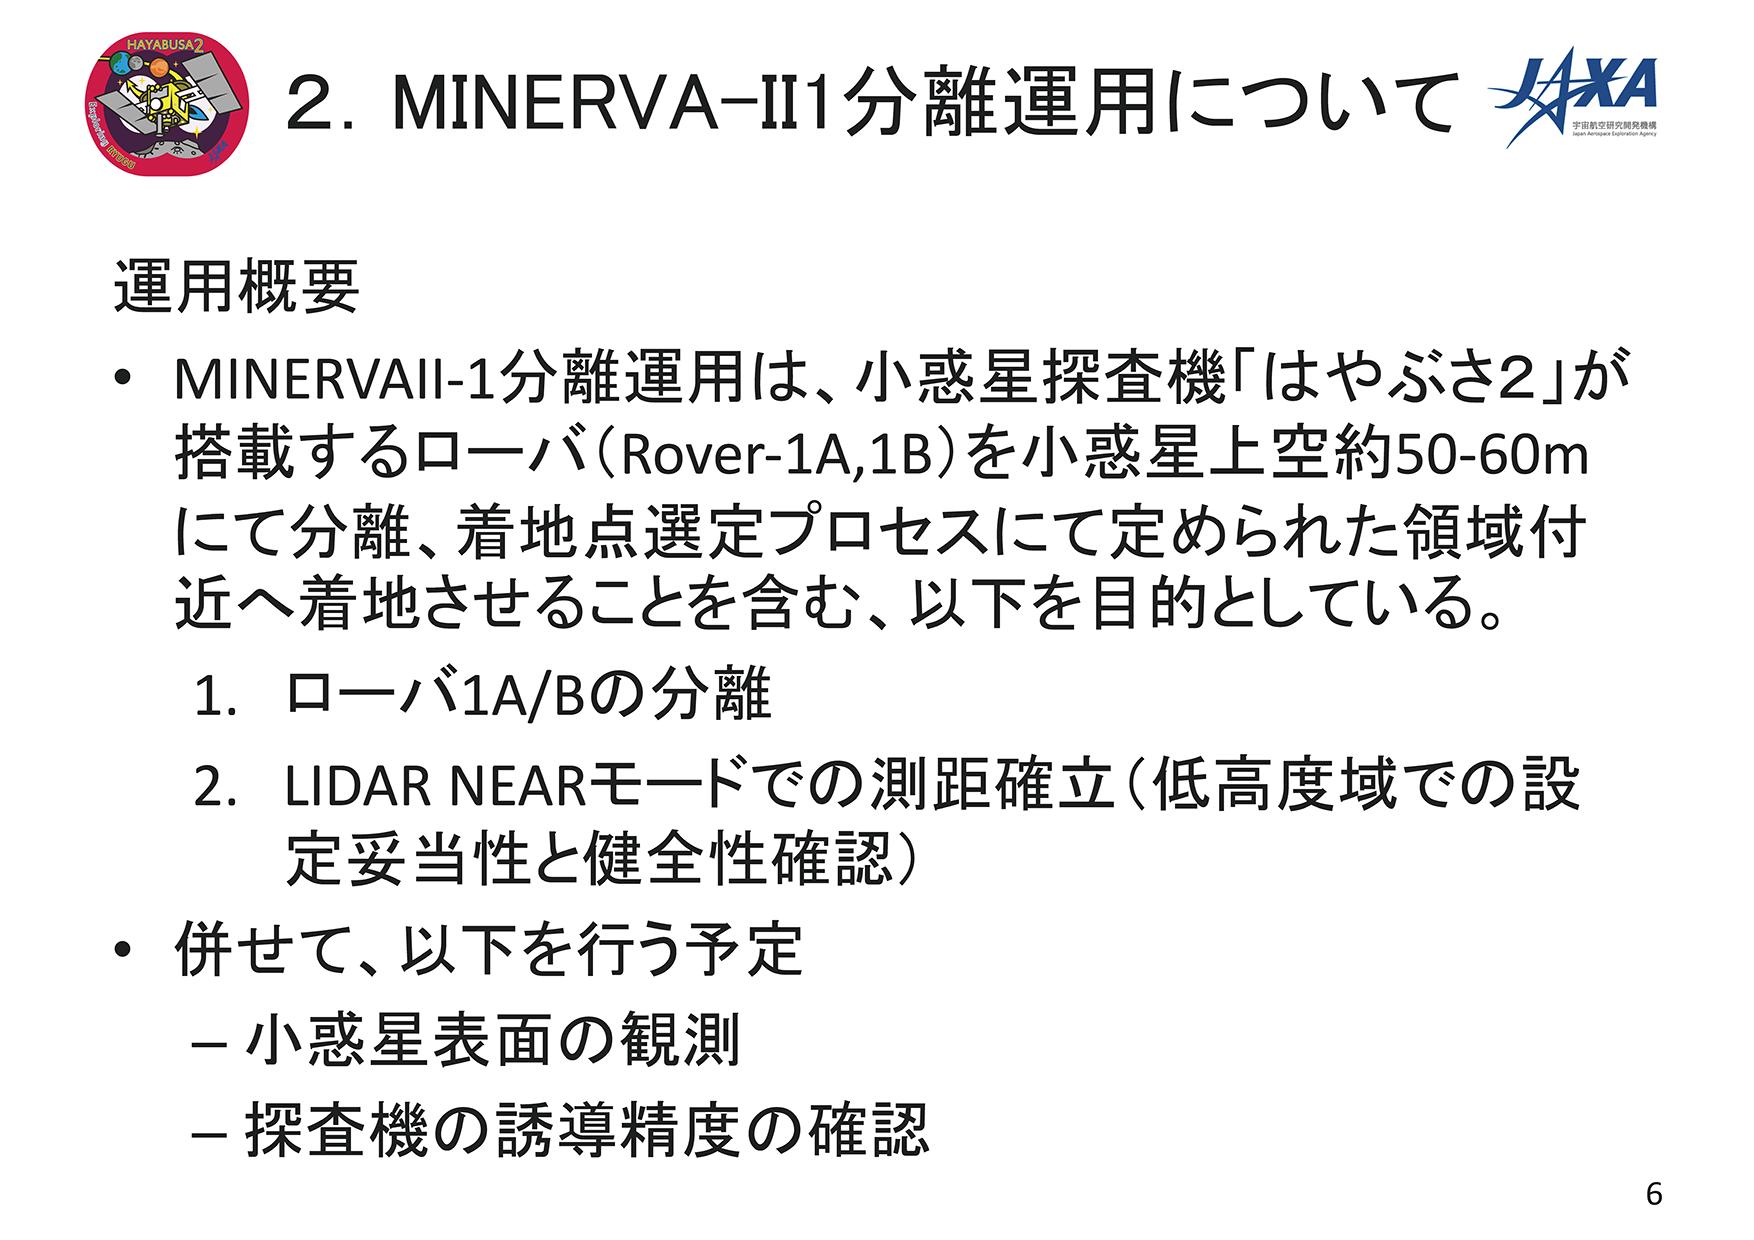 f:id:Imamura:20180921145456p:plain